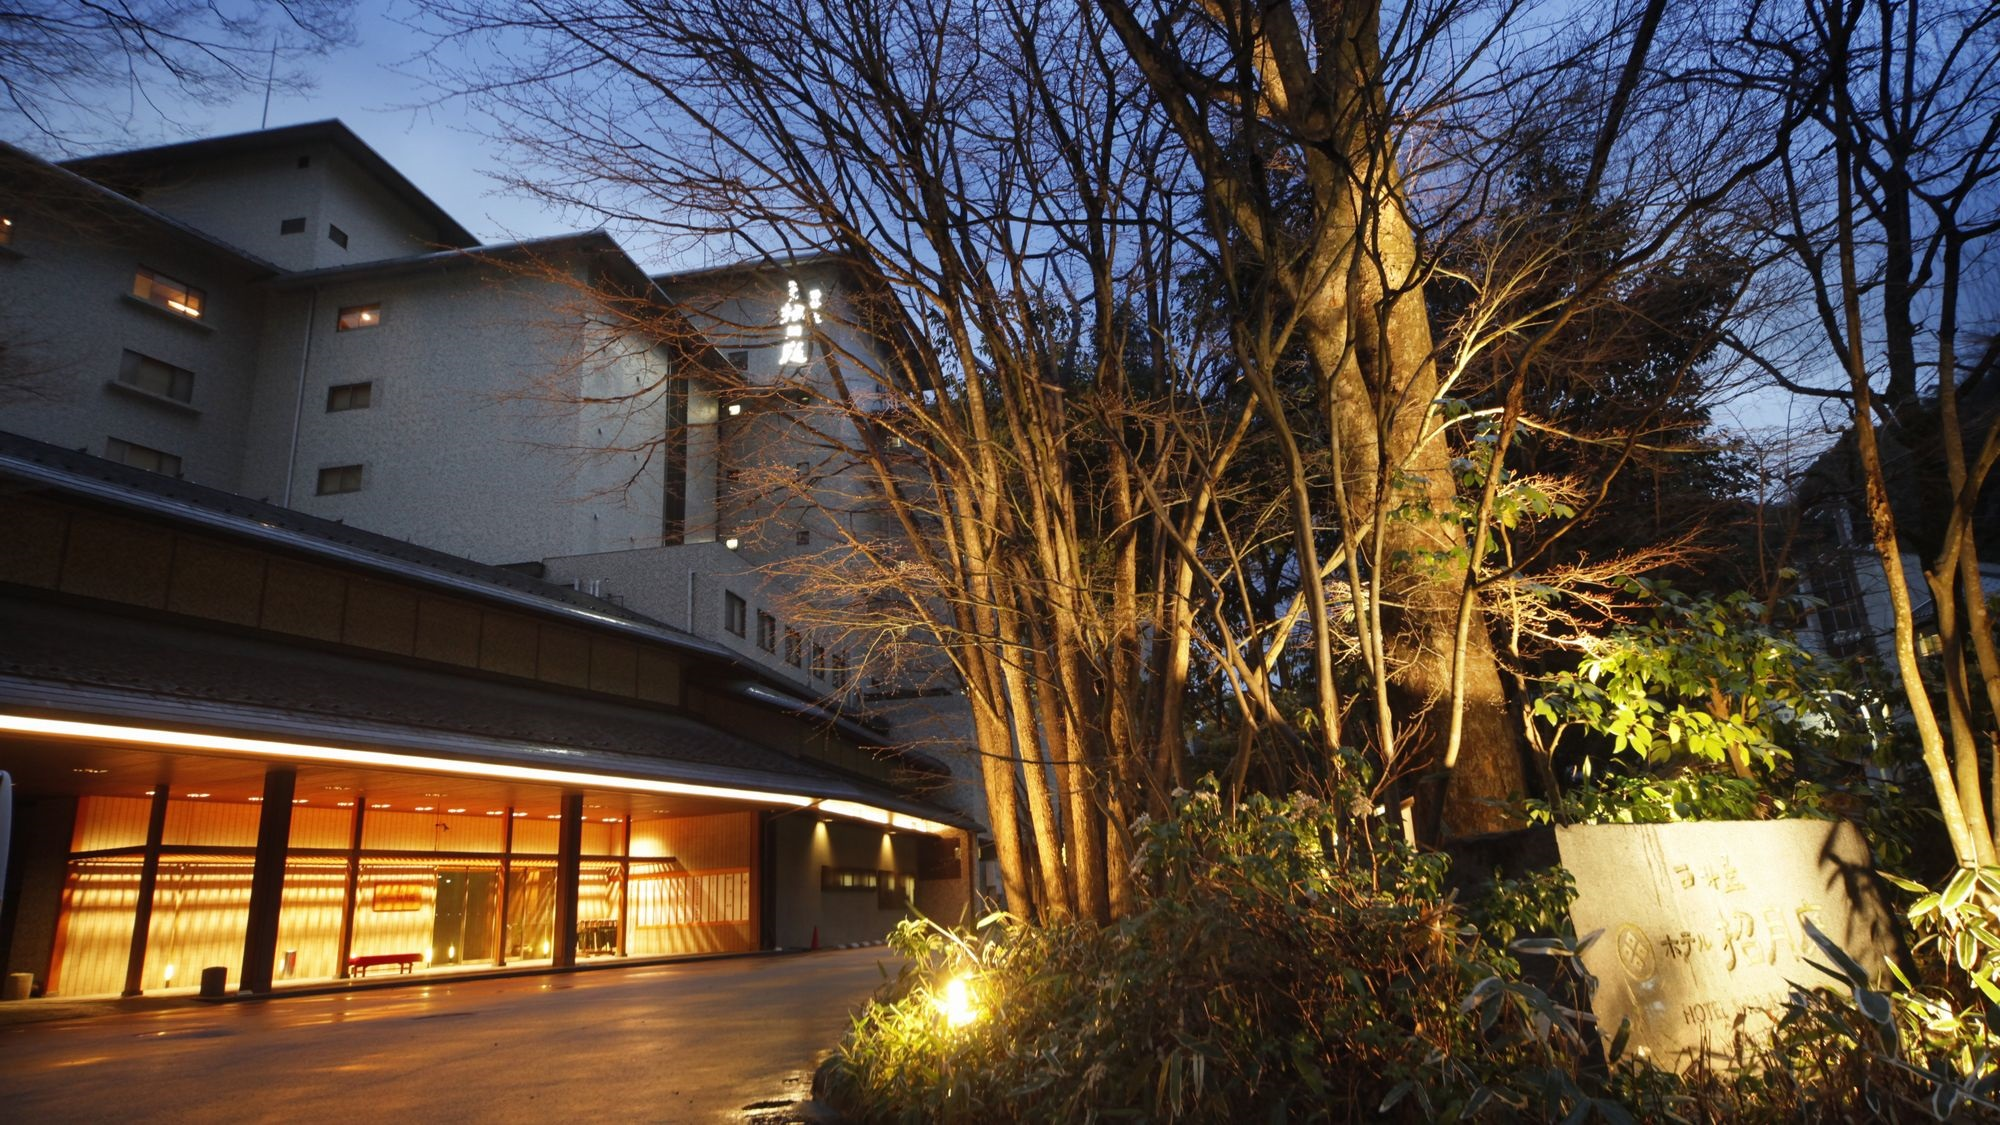 城崎温泉 西村屋ホテル招月庭 image